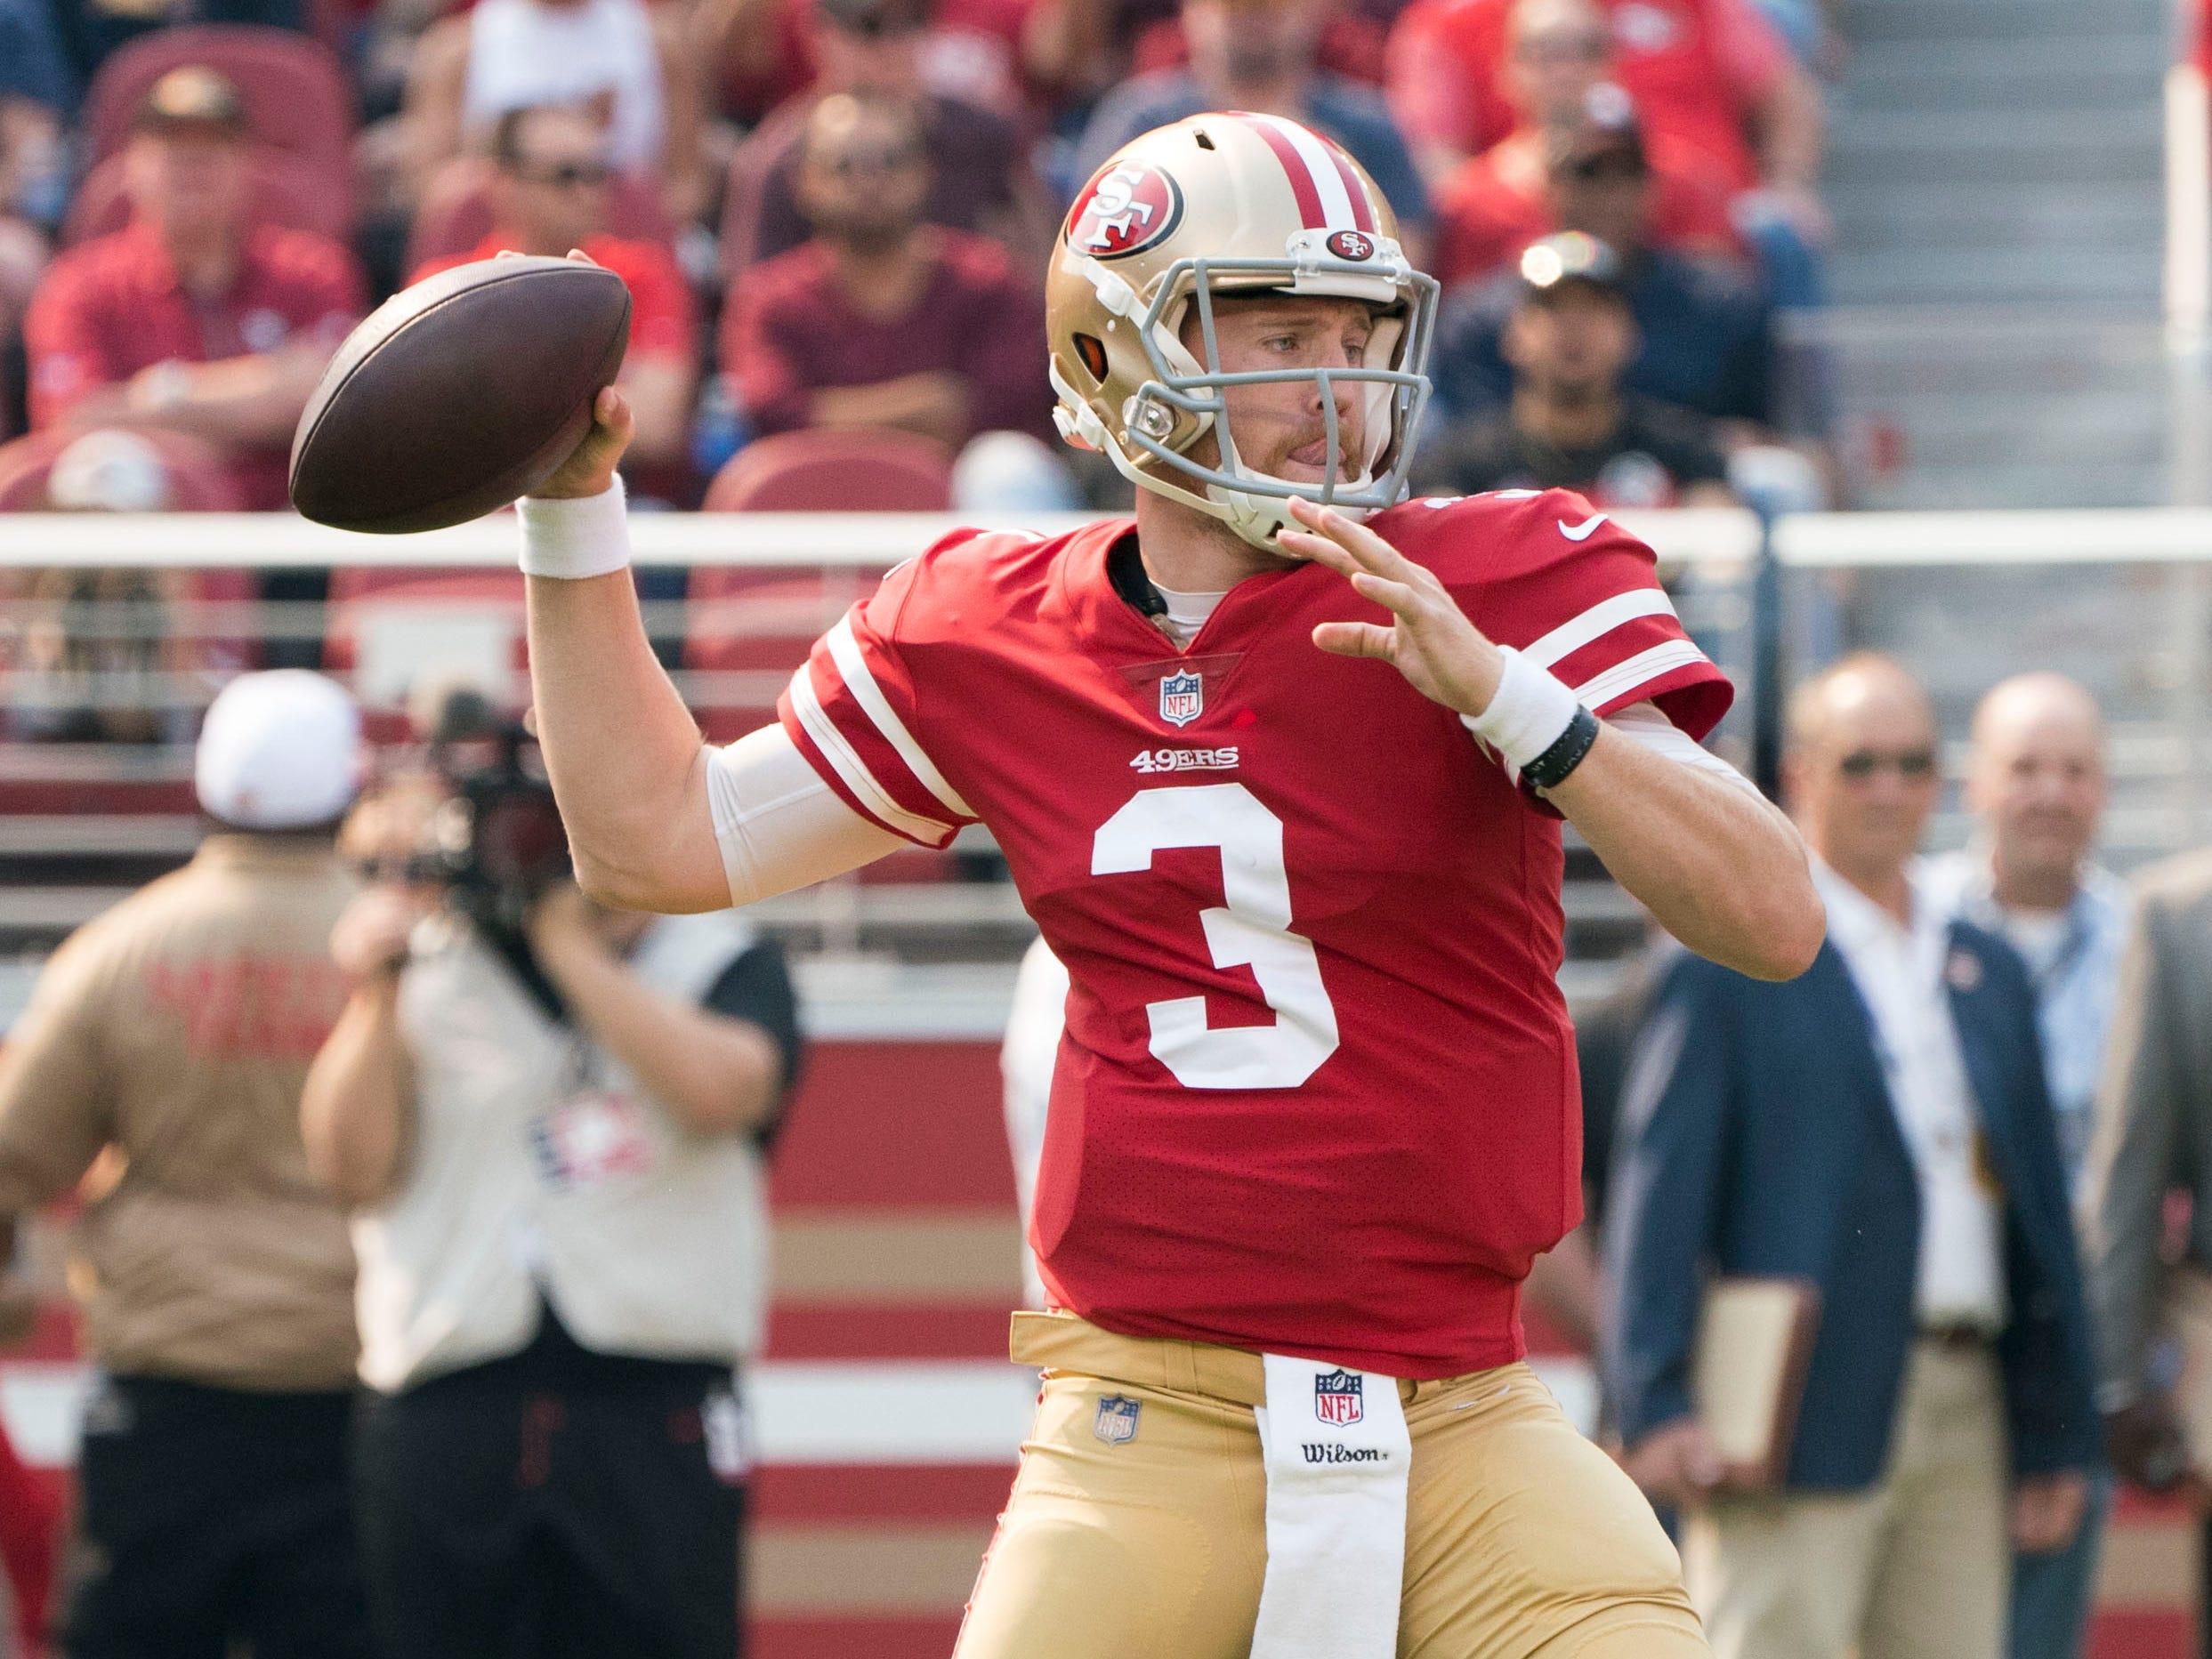 October 7, 2018; Santa Clara, CA, USA; San Francisco 49ers quarterback C.J. Beathard (3) throws the football against the Arizona Cardinals during the first quarter at Levi's Stadium.